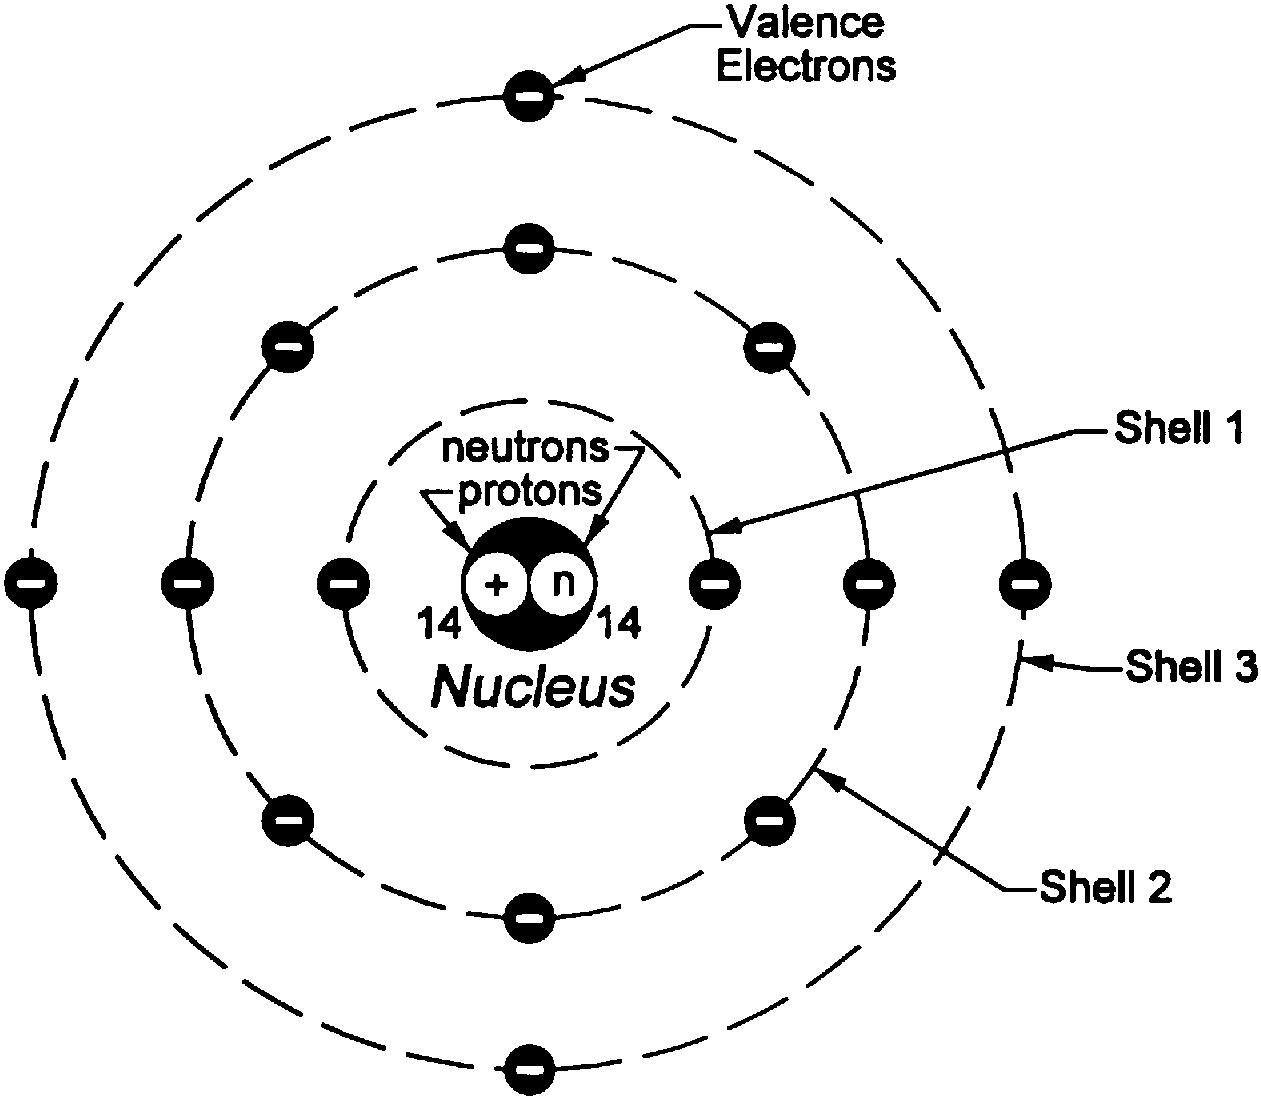 bohr diagram for silicon simple wiring post rh 29 asiagourmet igb de bohr diagram for nitrogen bohr diagram for sulfur [ 1261 x 1099 Pixel ]